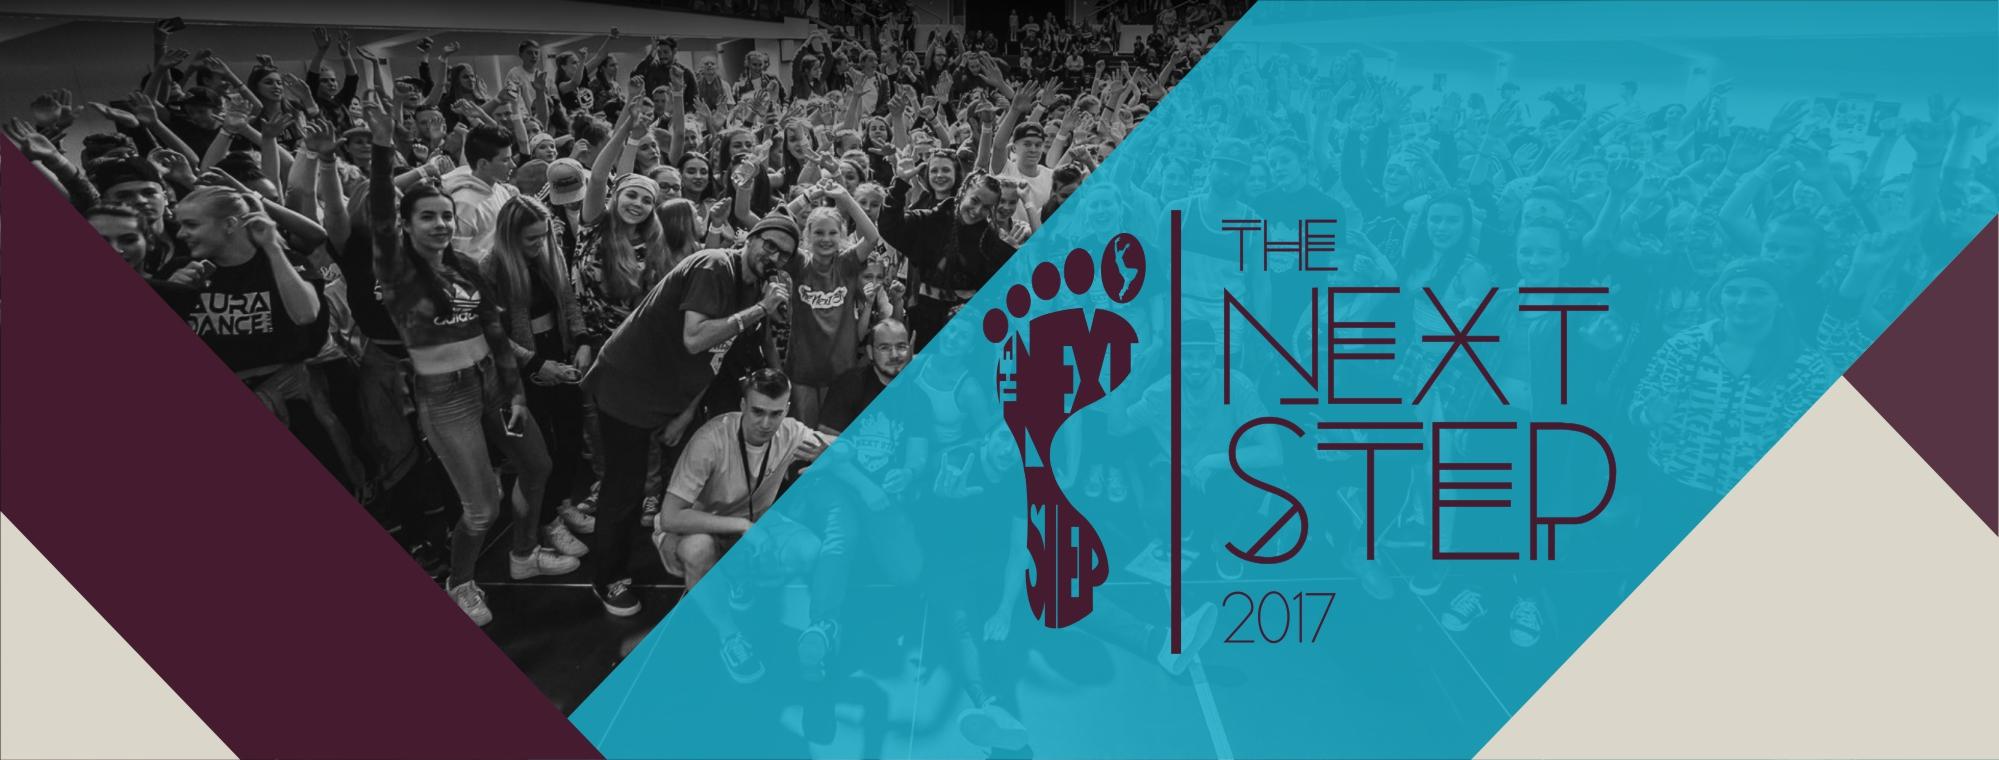 The Next Step 2017